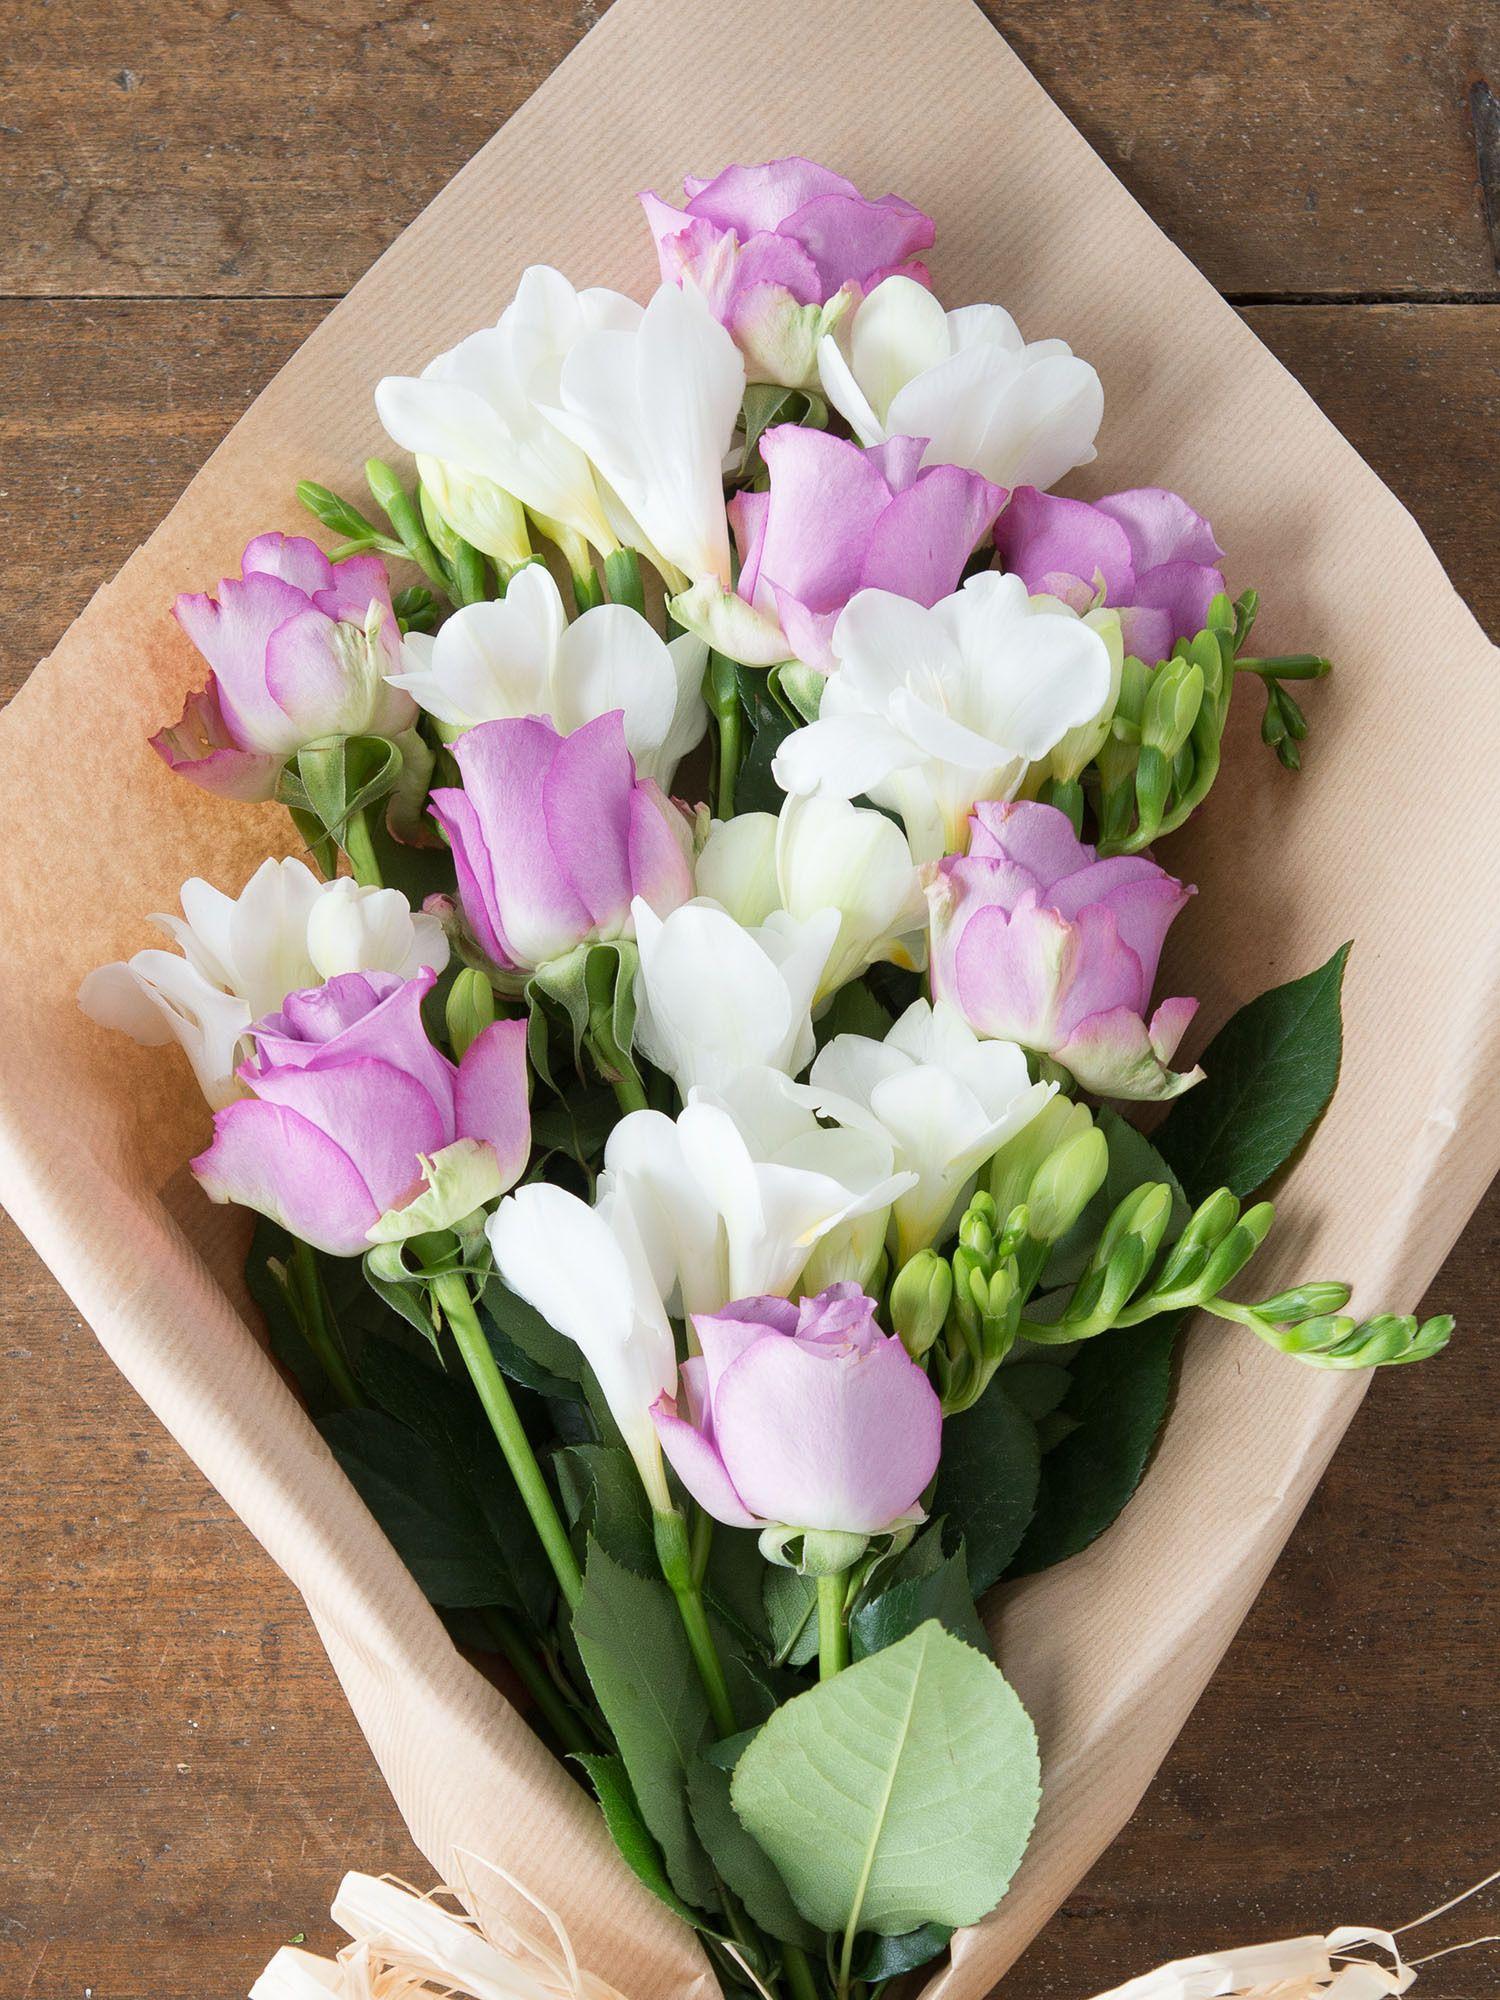 Lilac Roses White Freesia Flowers Direct Zvetochki Pinterest